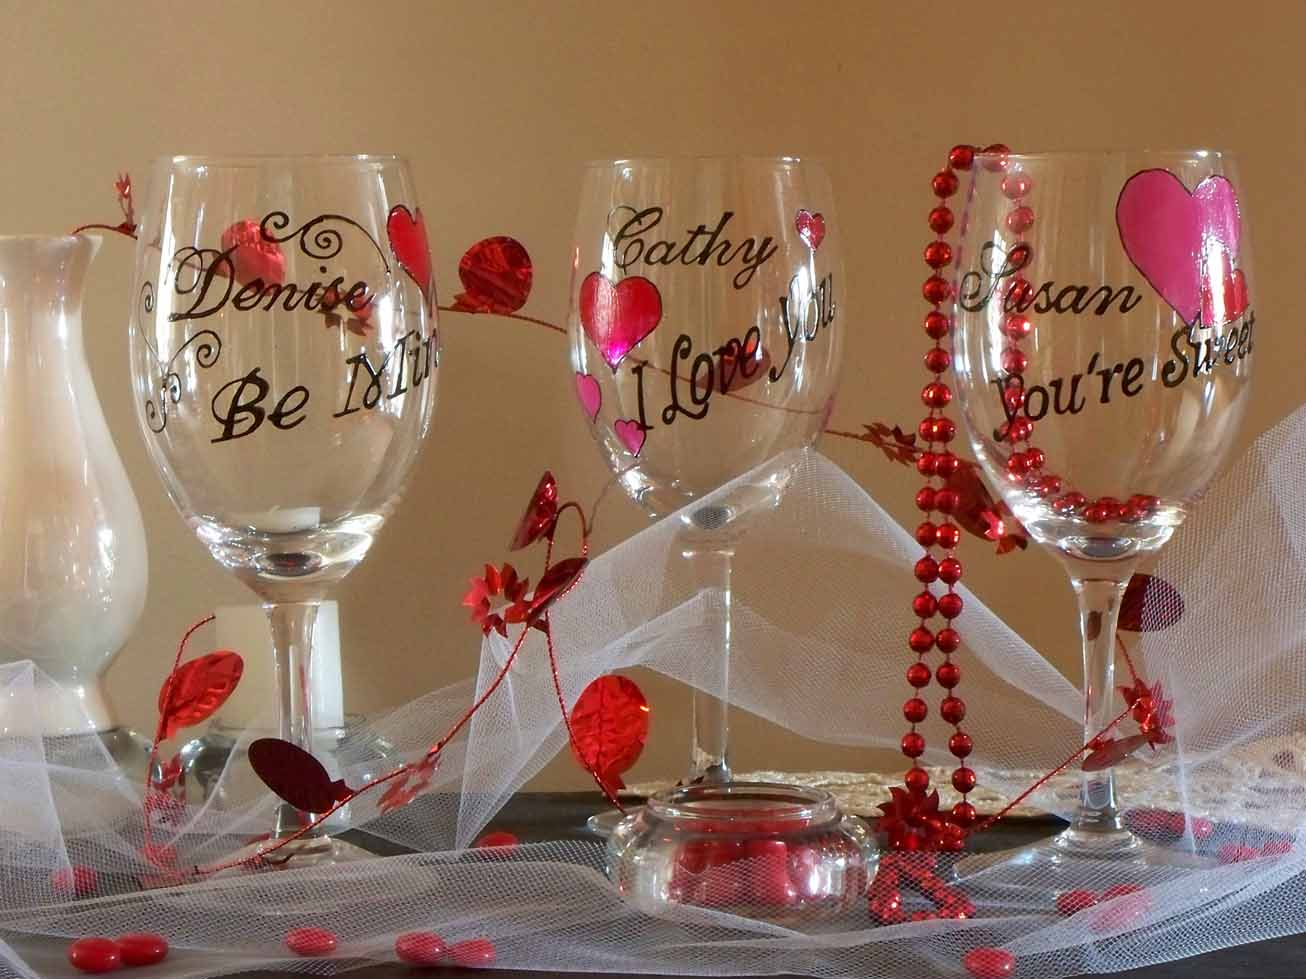 valentines day wine glass be mine - Valentines Day Wine